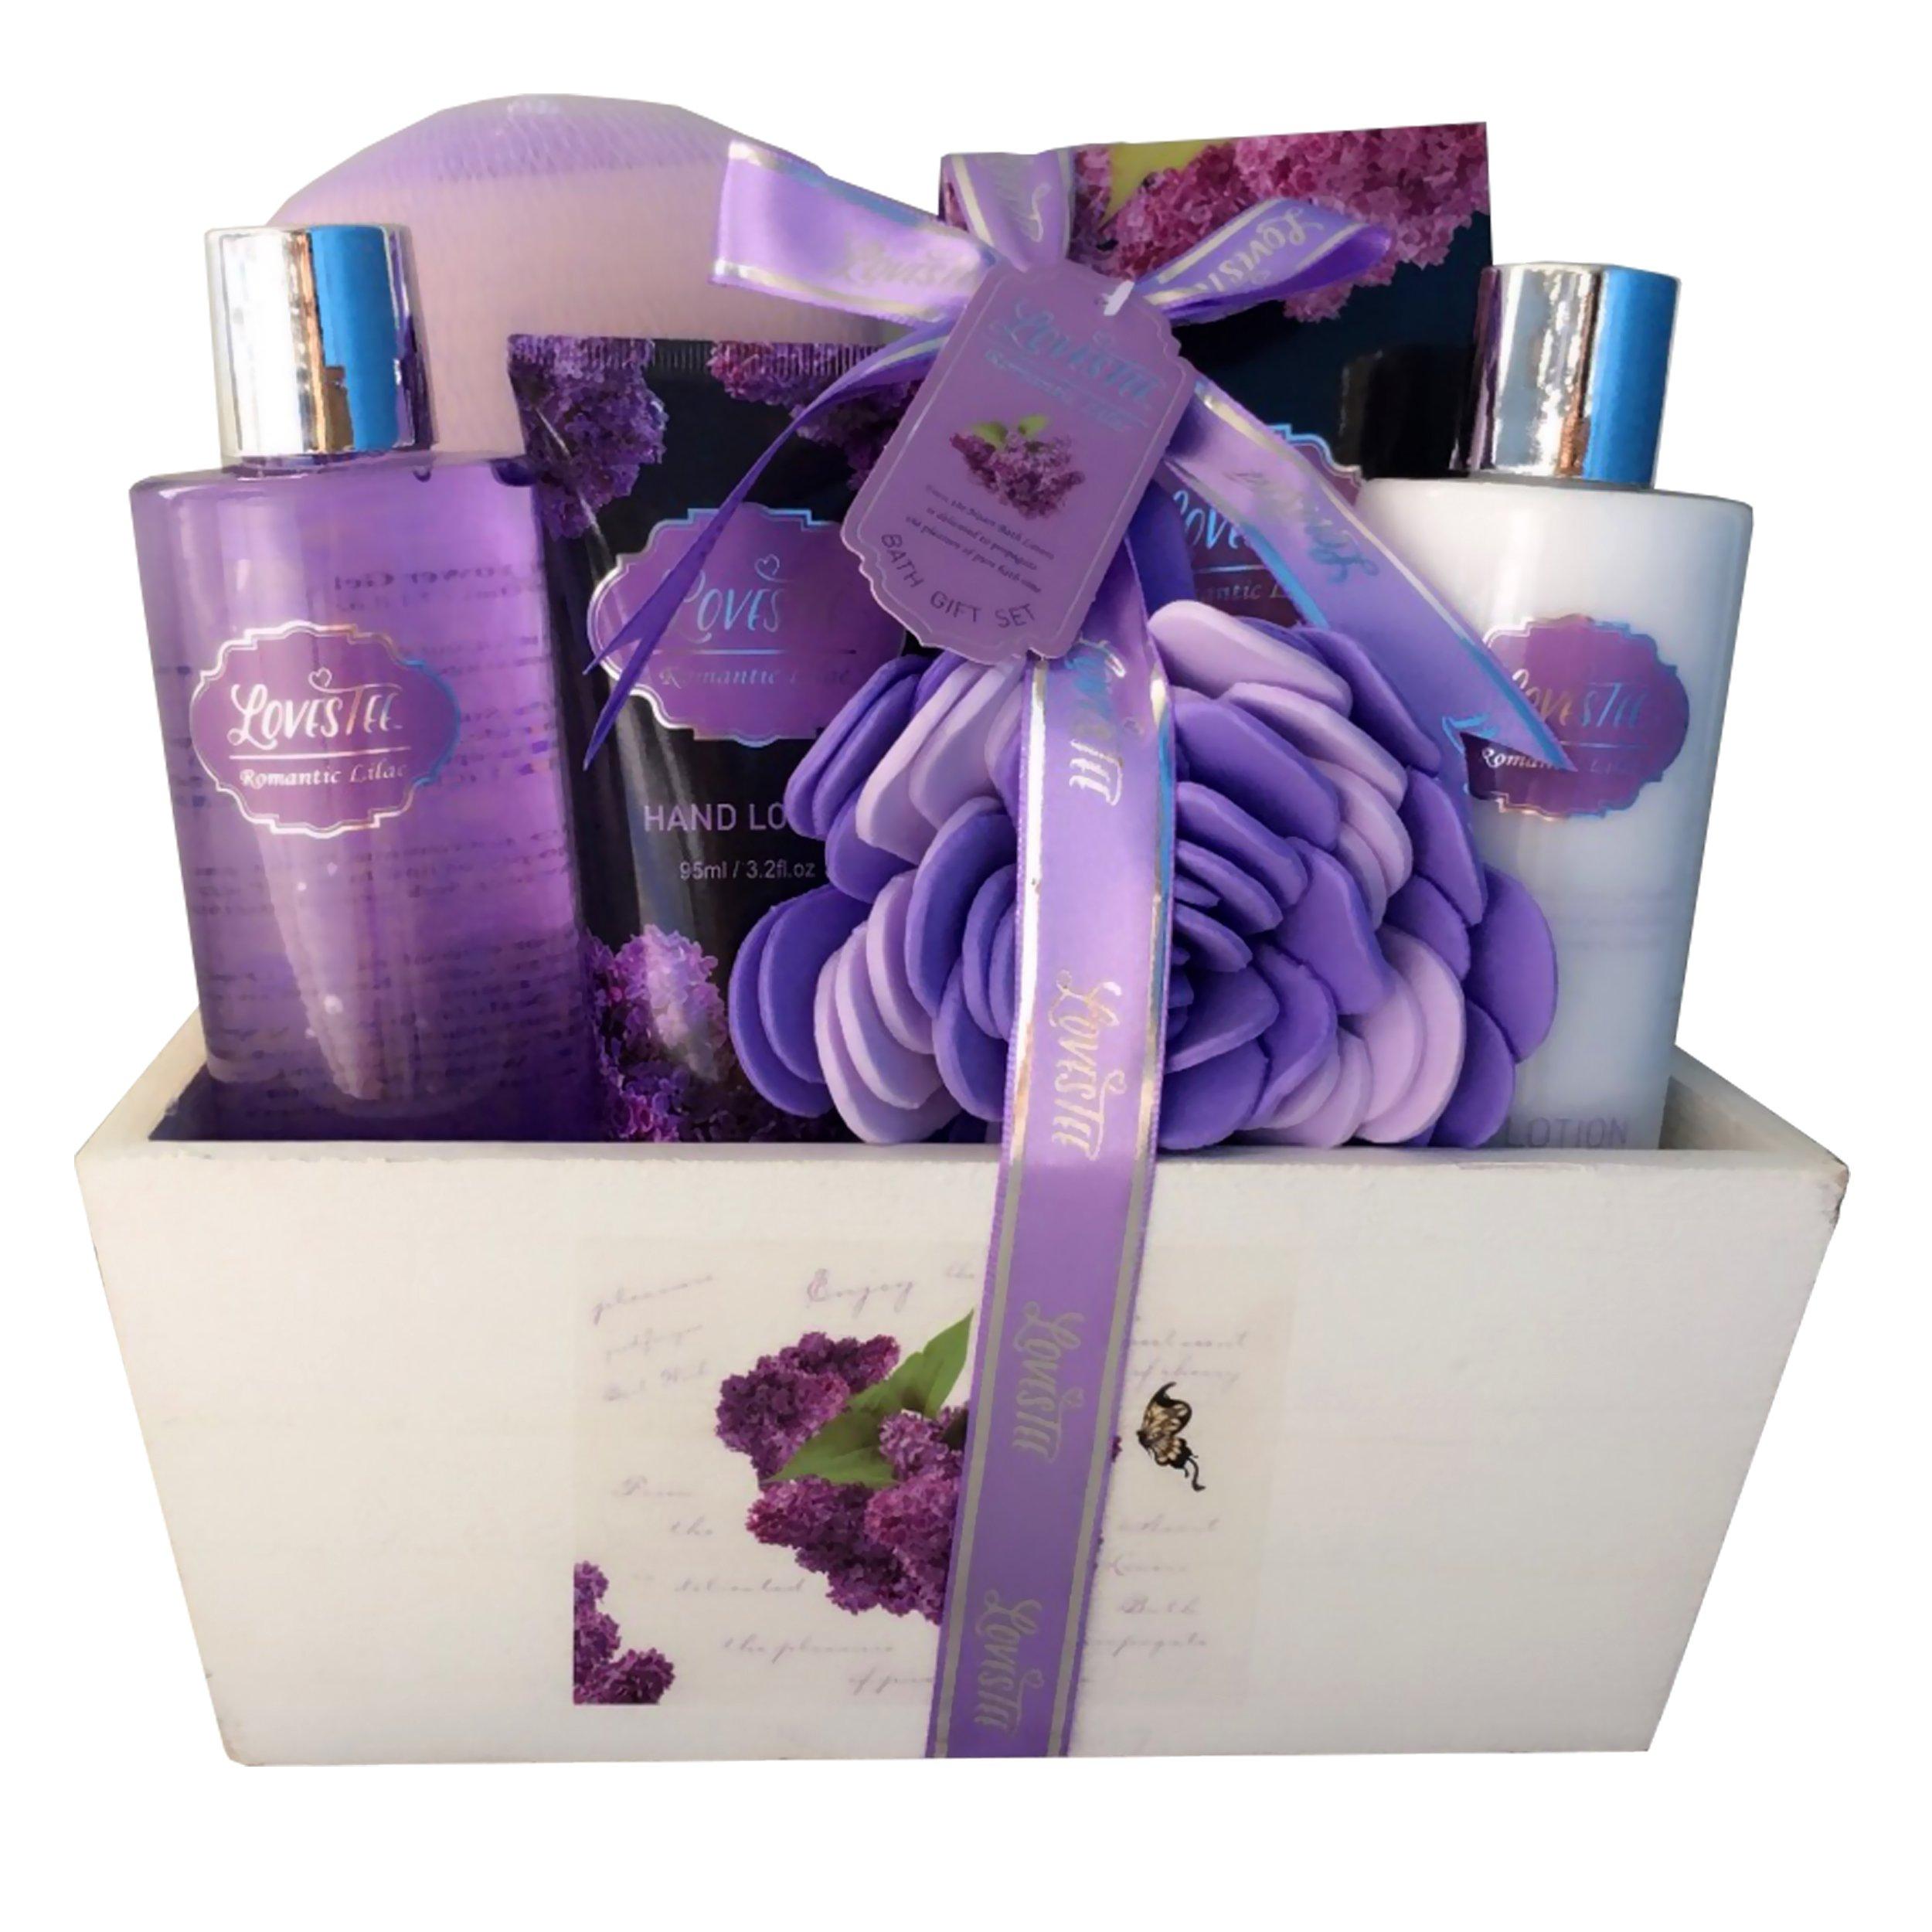 Spa Gift Basket, Spa Basket with Lavender Fragrance, Lilac color by Lovestee - Bath and Body Gift Set, Includes Shower Gel, Body Lotion, Hand Lotion, Bath Salt, Flower Bath-Body Sponge and EVA Sponge by Lovestee